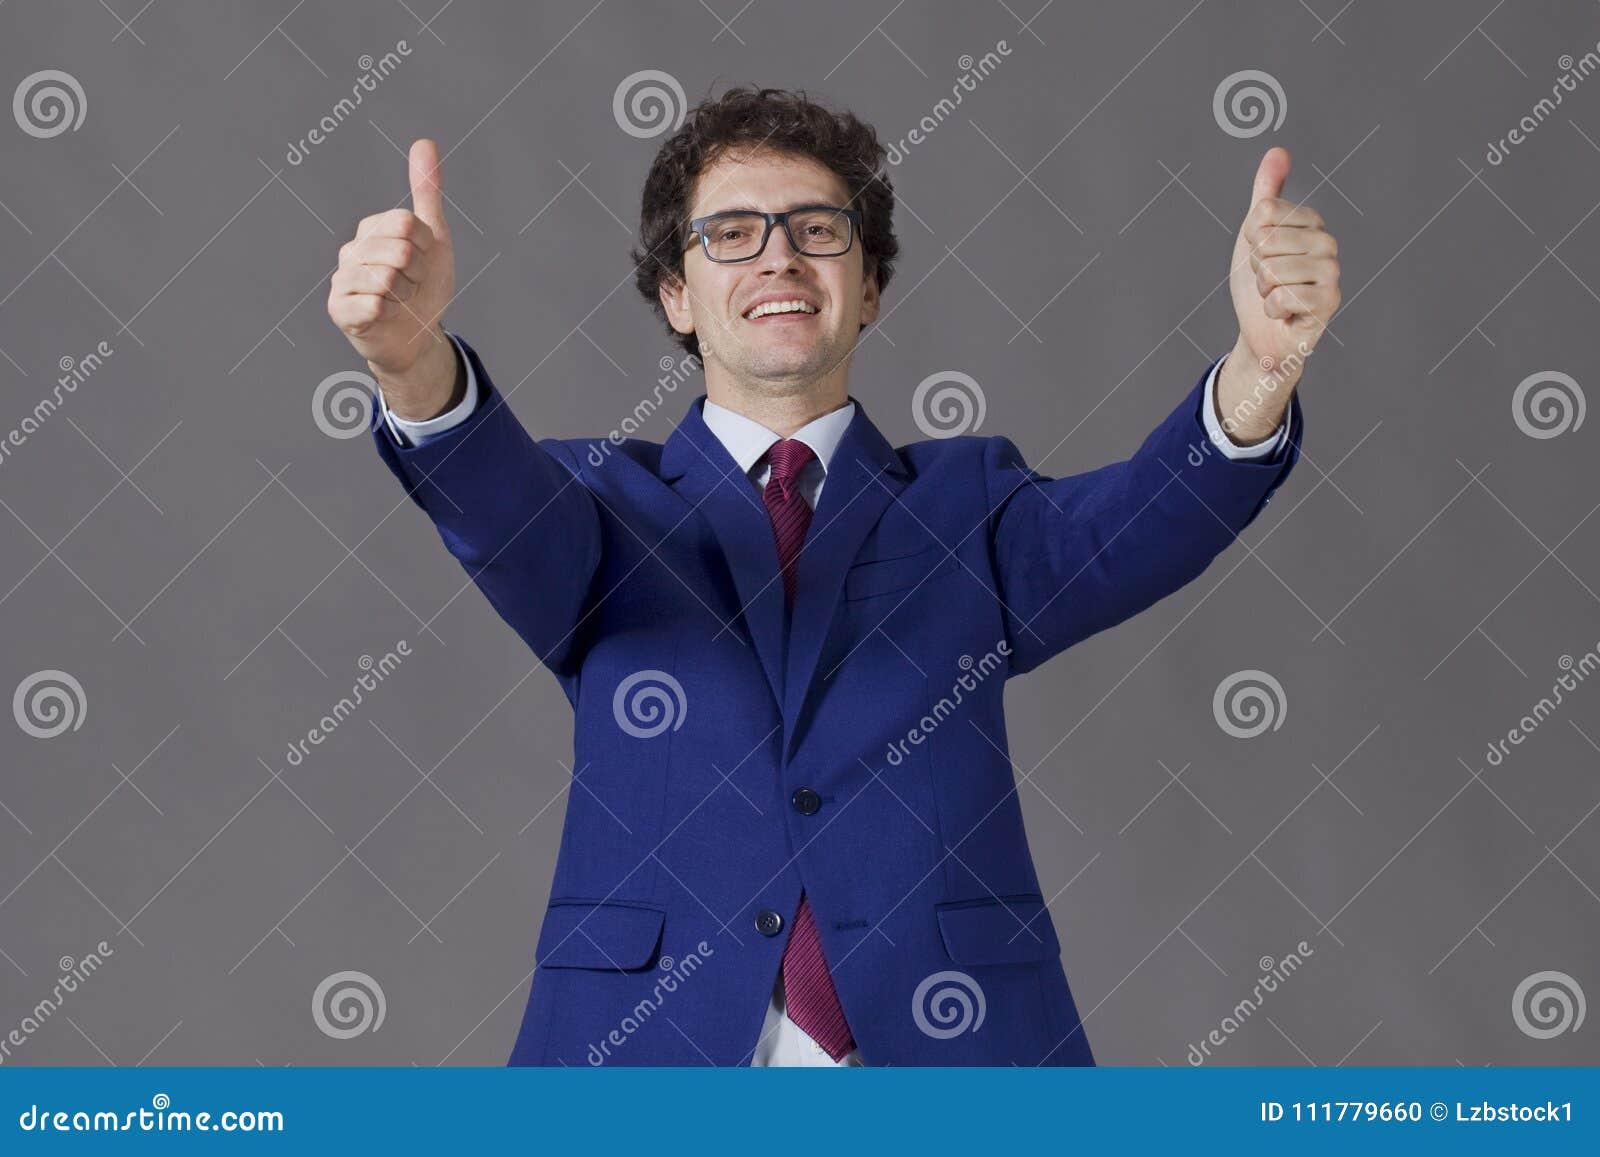 Happy handsome man showing big thumbs up